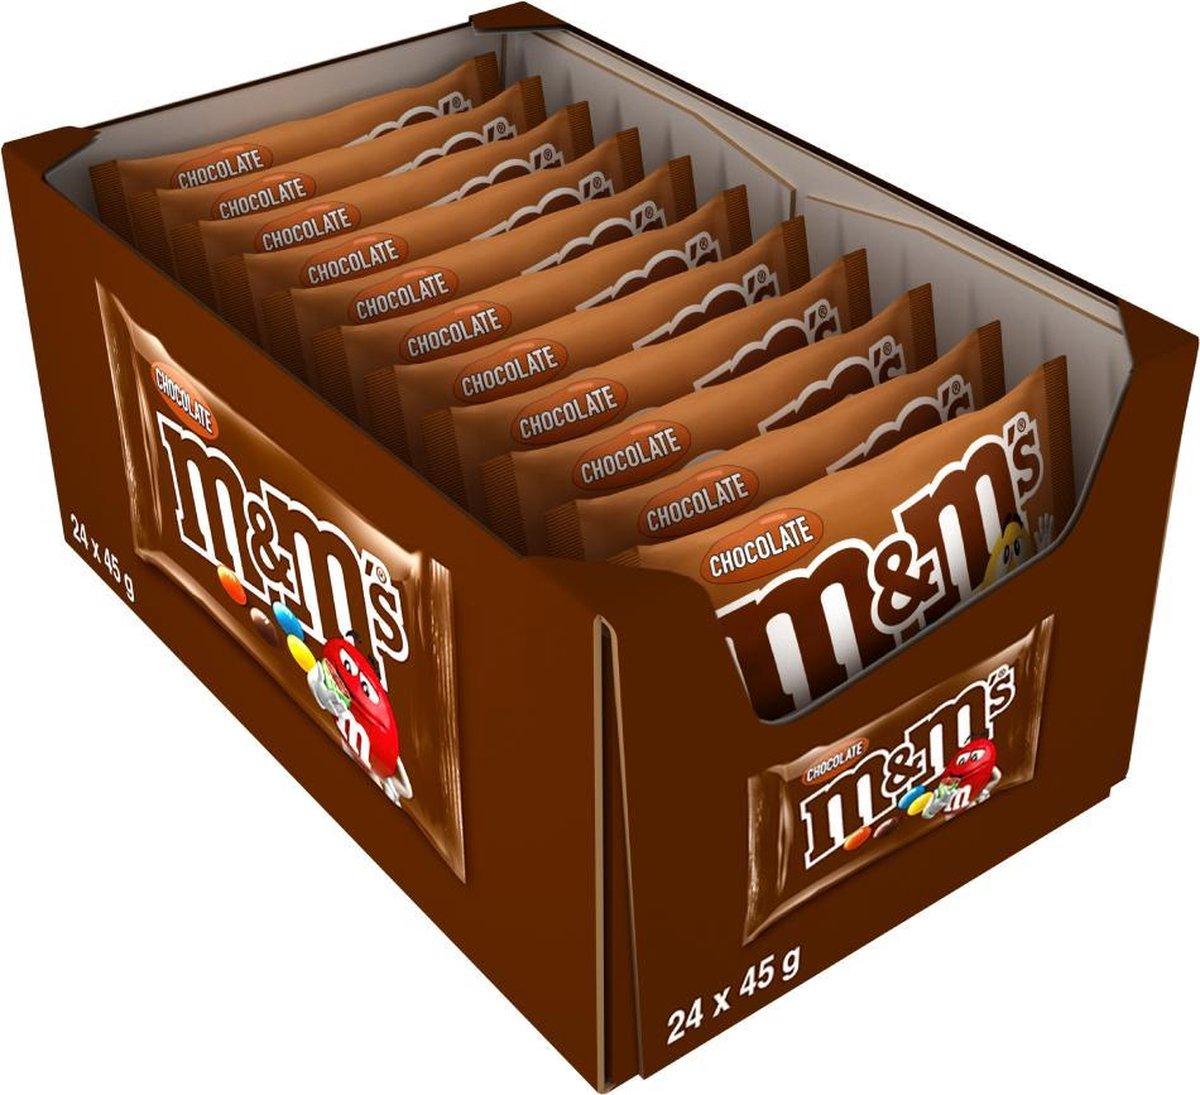 M&M'S choco melkchocolade uitdeelzakjes - 24 x 45 gram